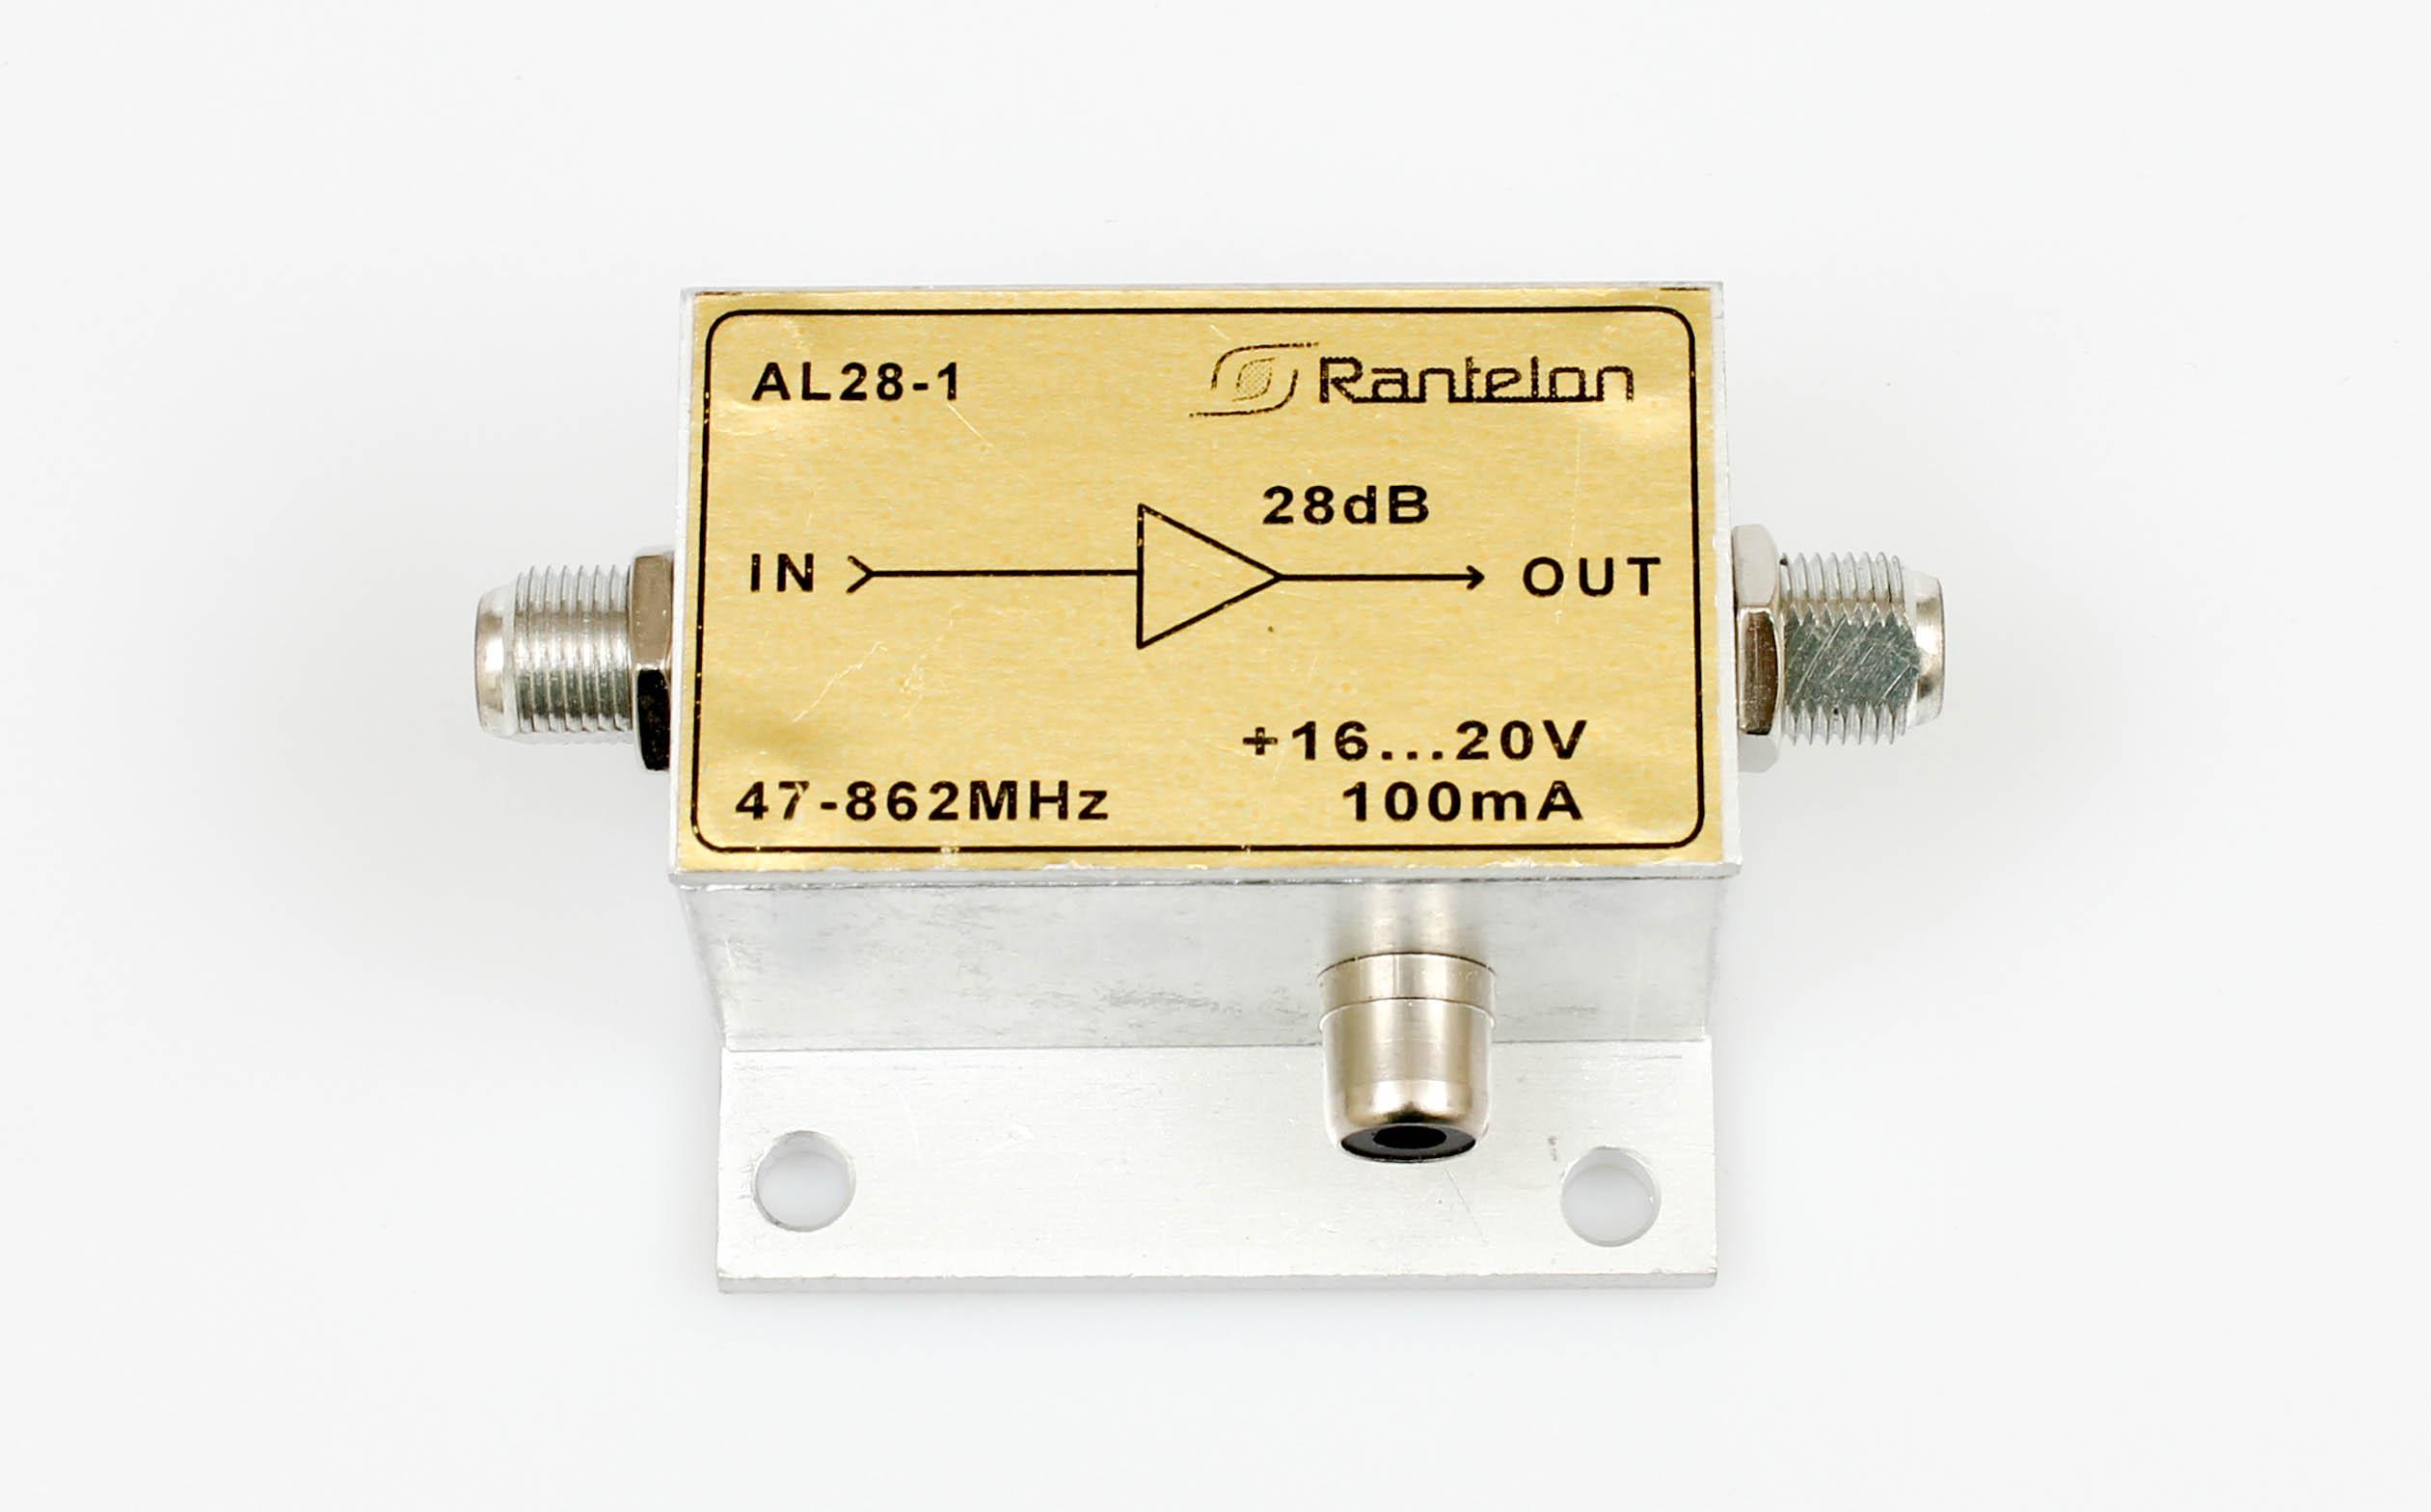 AL28-1